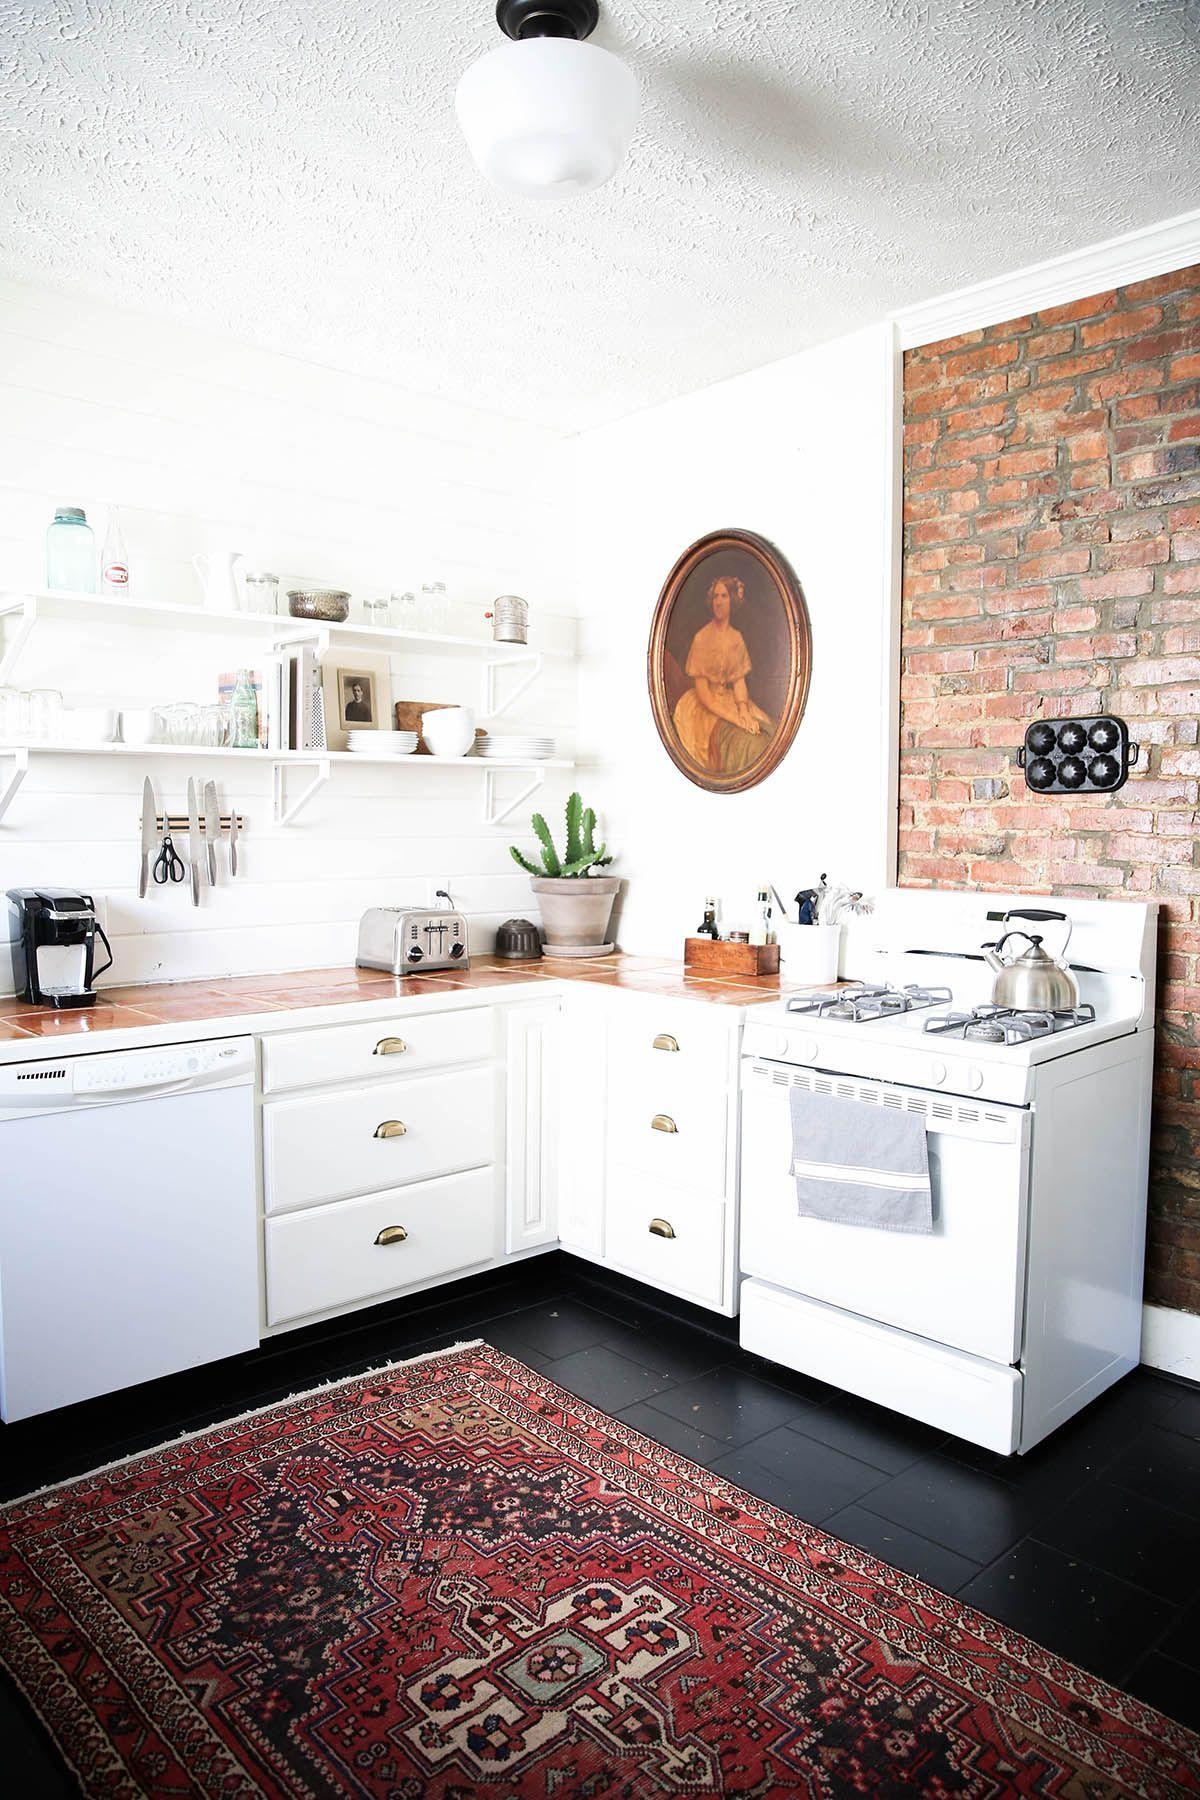 minimal rustic antique home decor, kitchen decor idea, McCarn airbnb ...